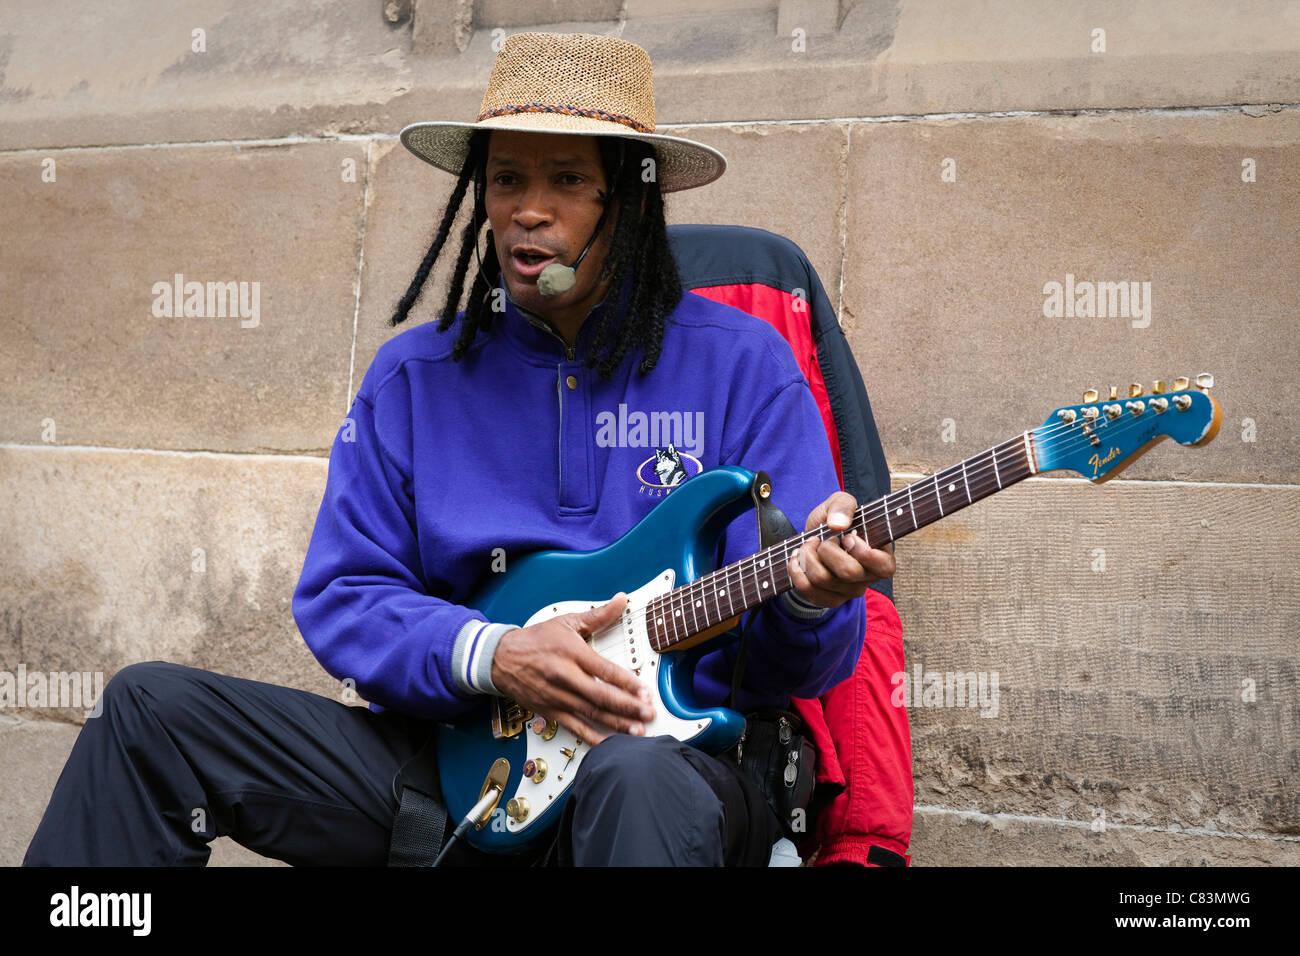 Richard Blues playing the guitar and street busking at Edinburgh Fringe Festival, Edinburgh, Scotland, Great Britain - Stock Image